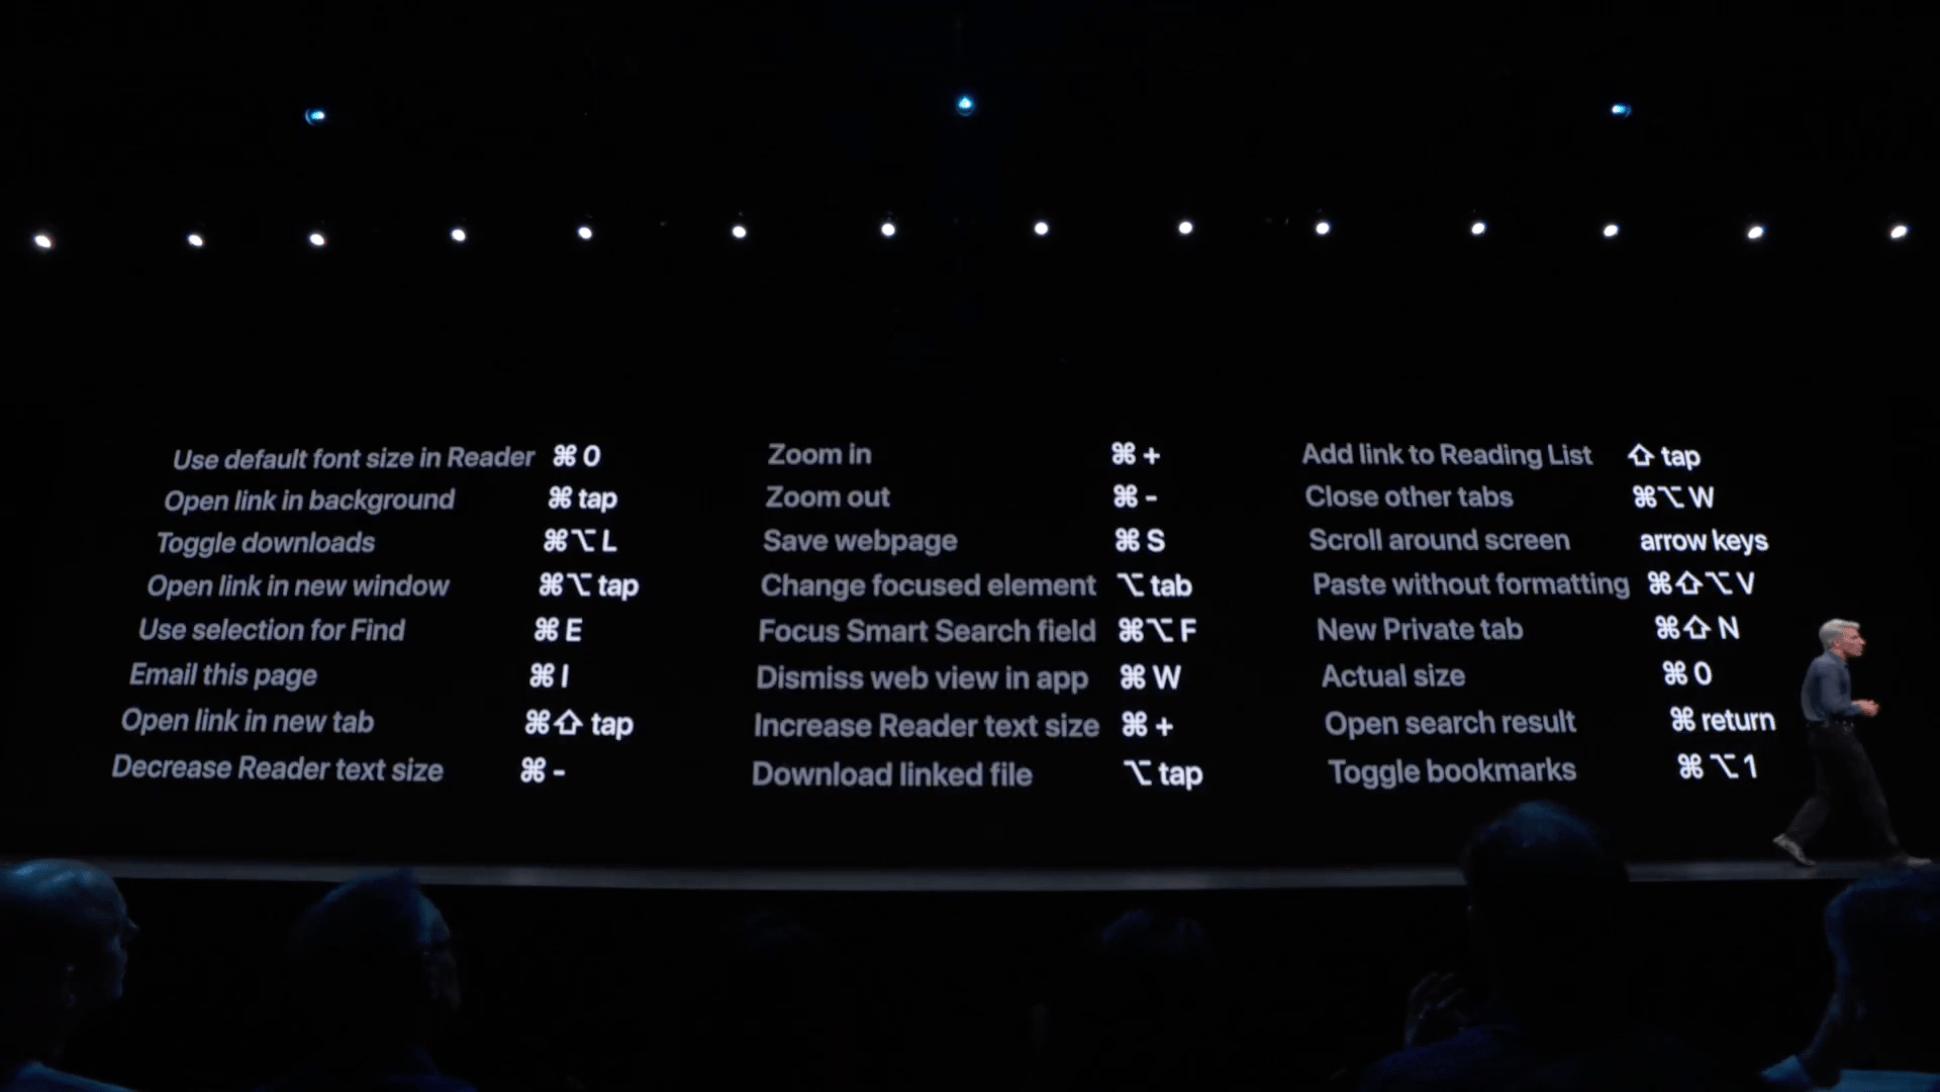 Safari keyboard shortcuts on iPadOS 13